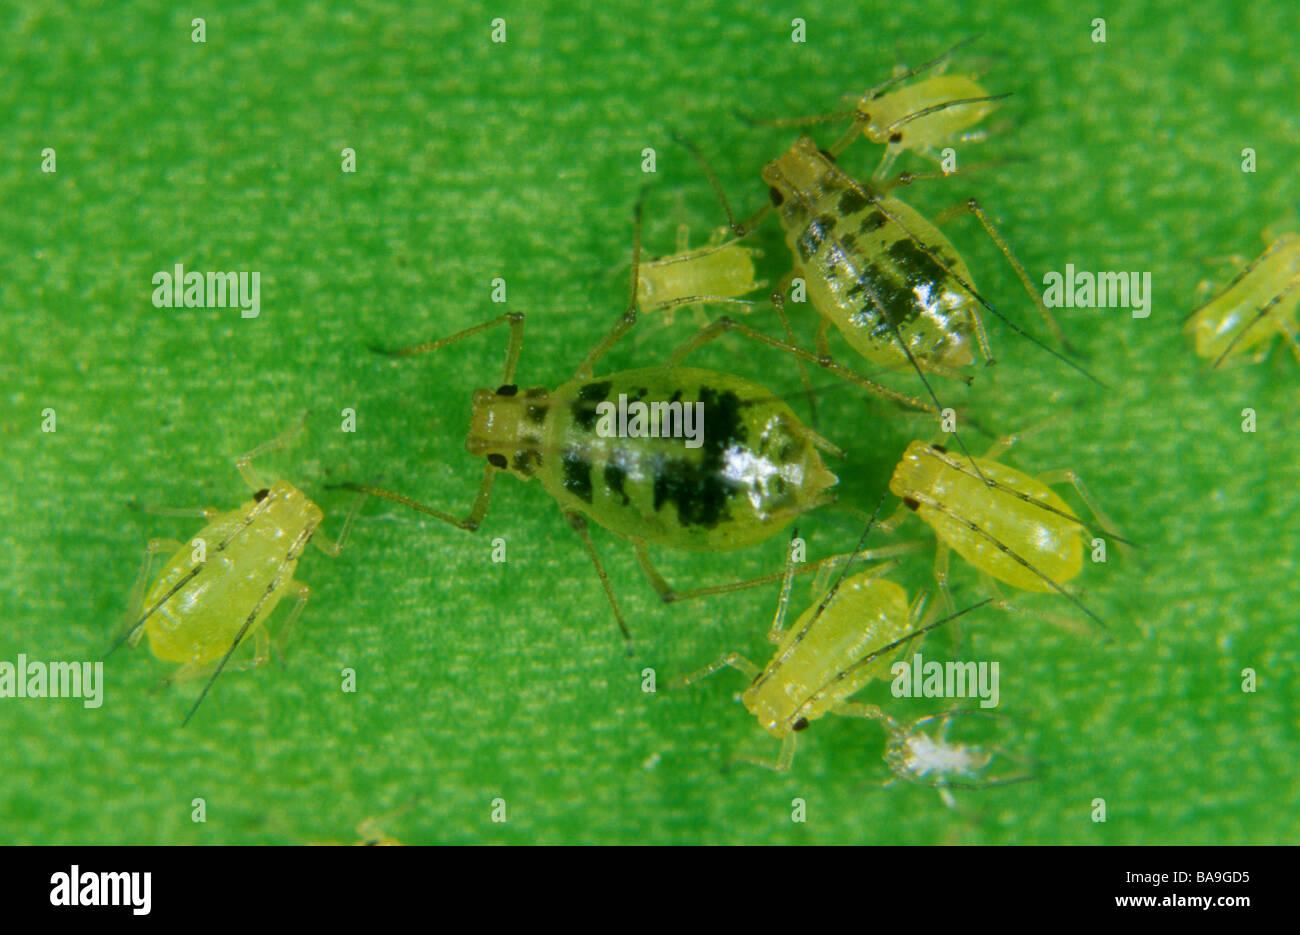 mottled-arum-aphid-aulacorthum-circumflexum-female-and-juveniles-on-BA9GD5.jpg